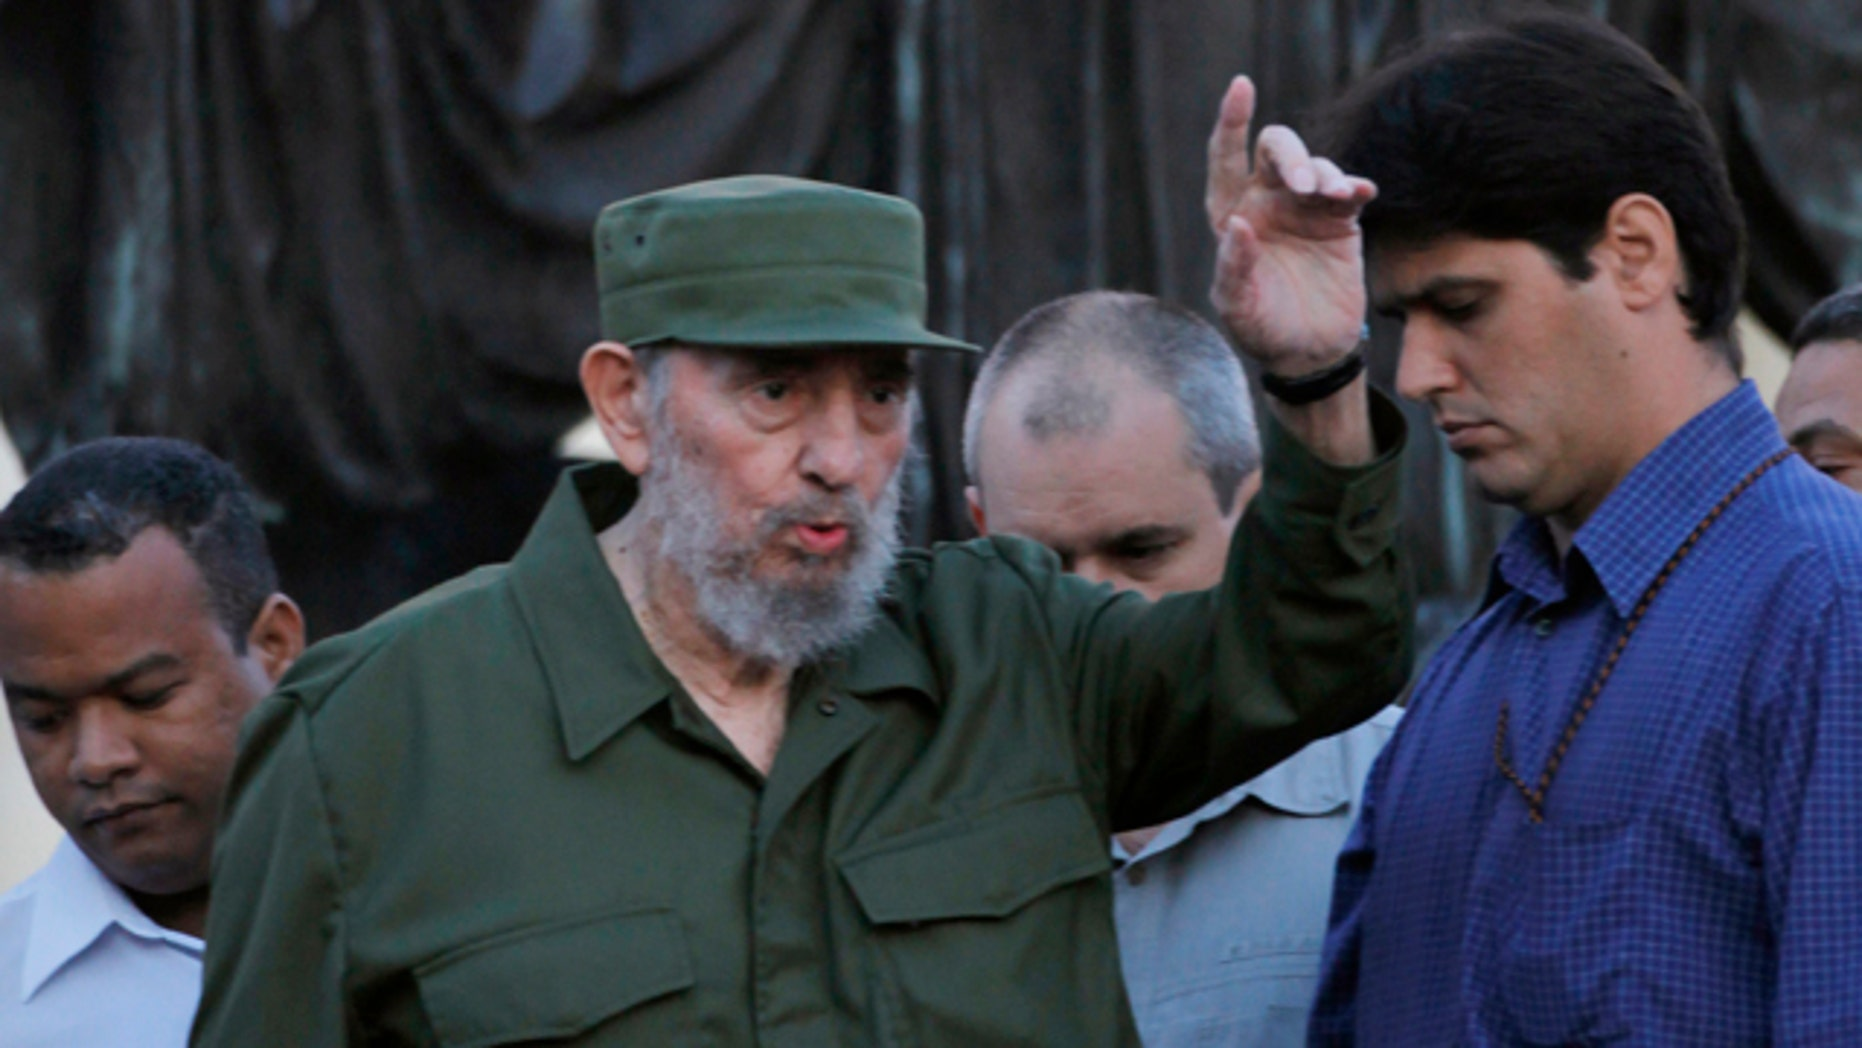 Sept. 3: Cuba's leader Fidel Castro greets students before delivering a speech outside Havana's University in Havana, Cuba.